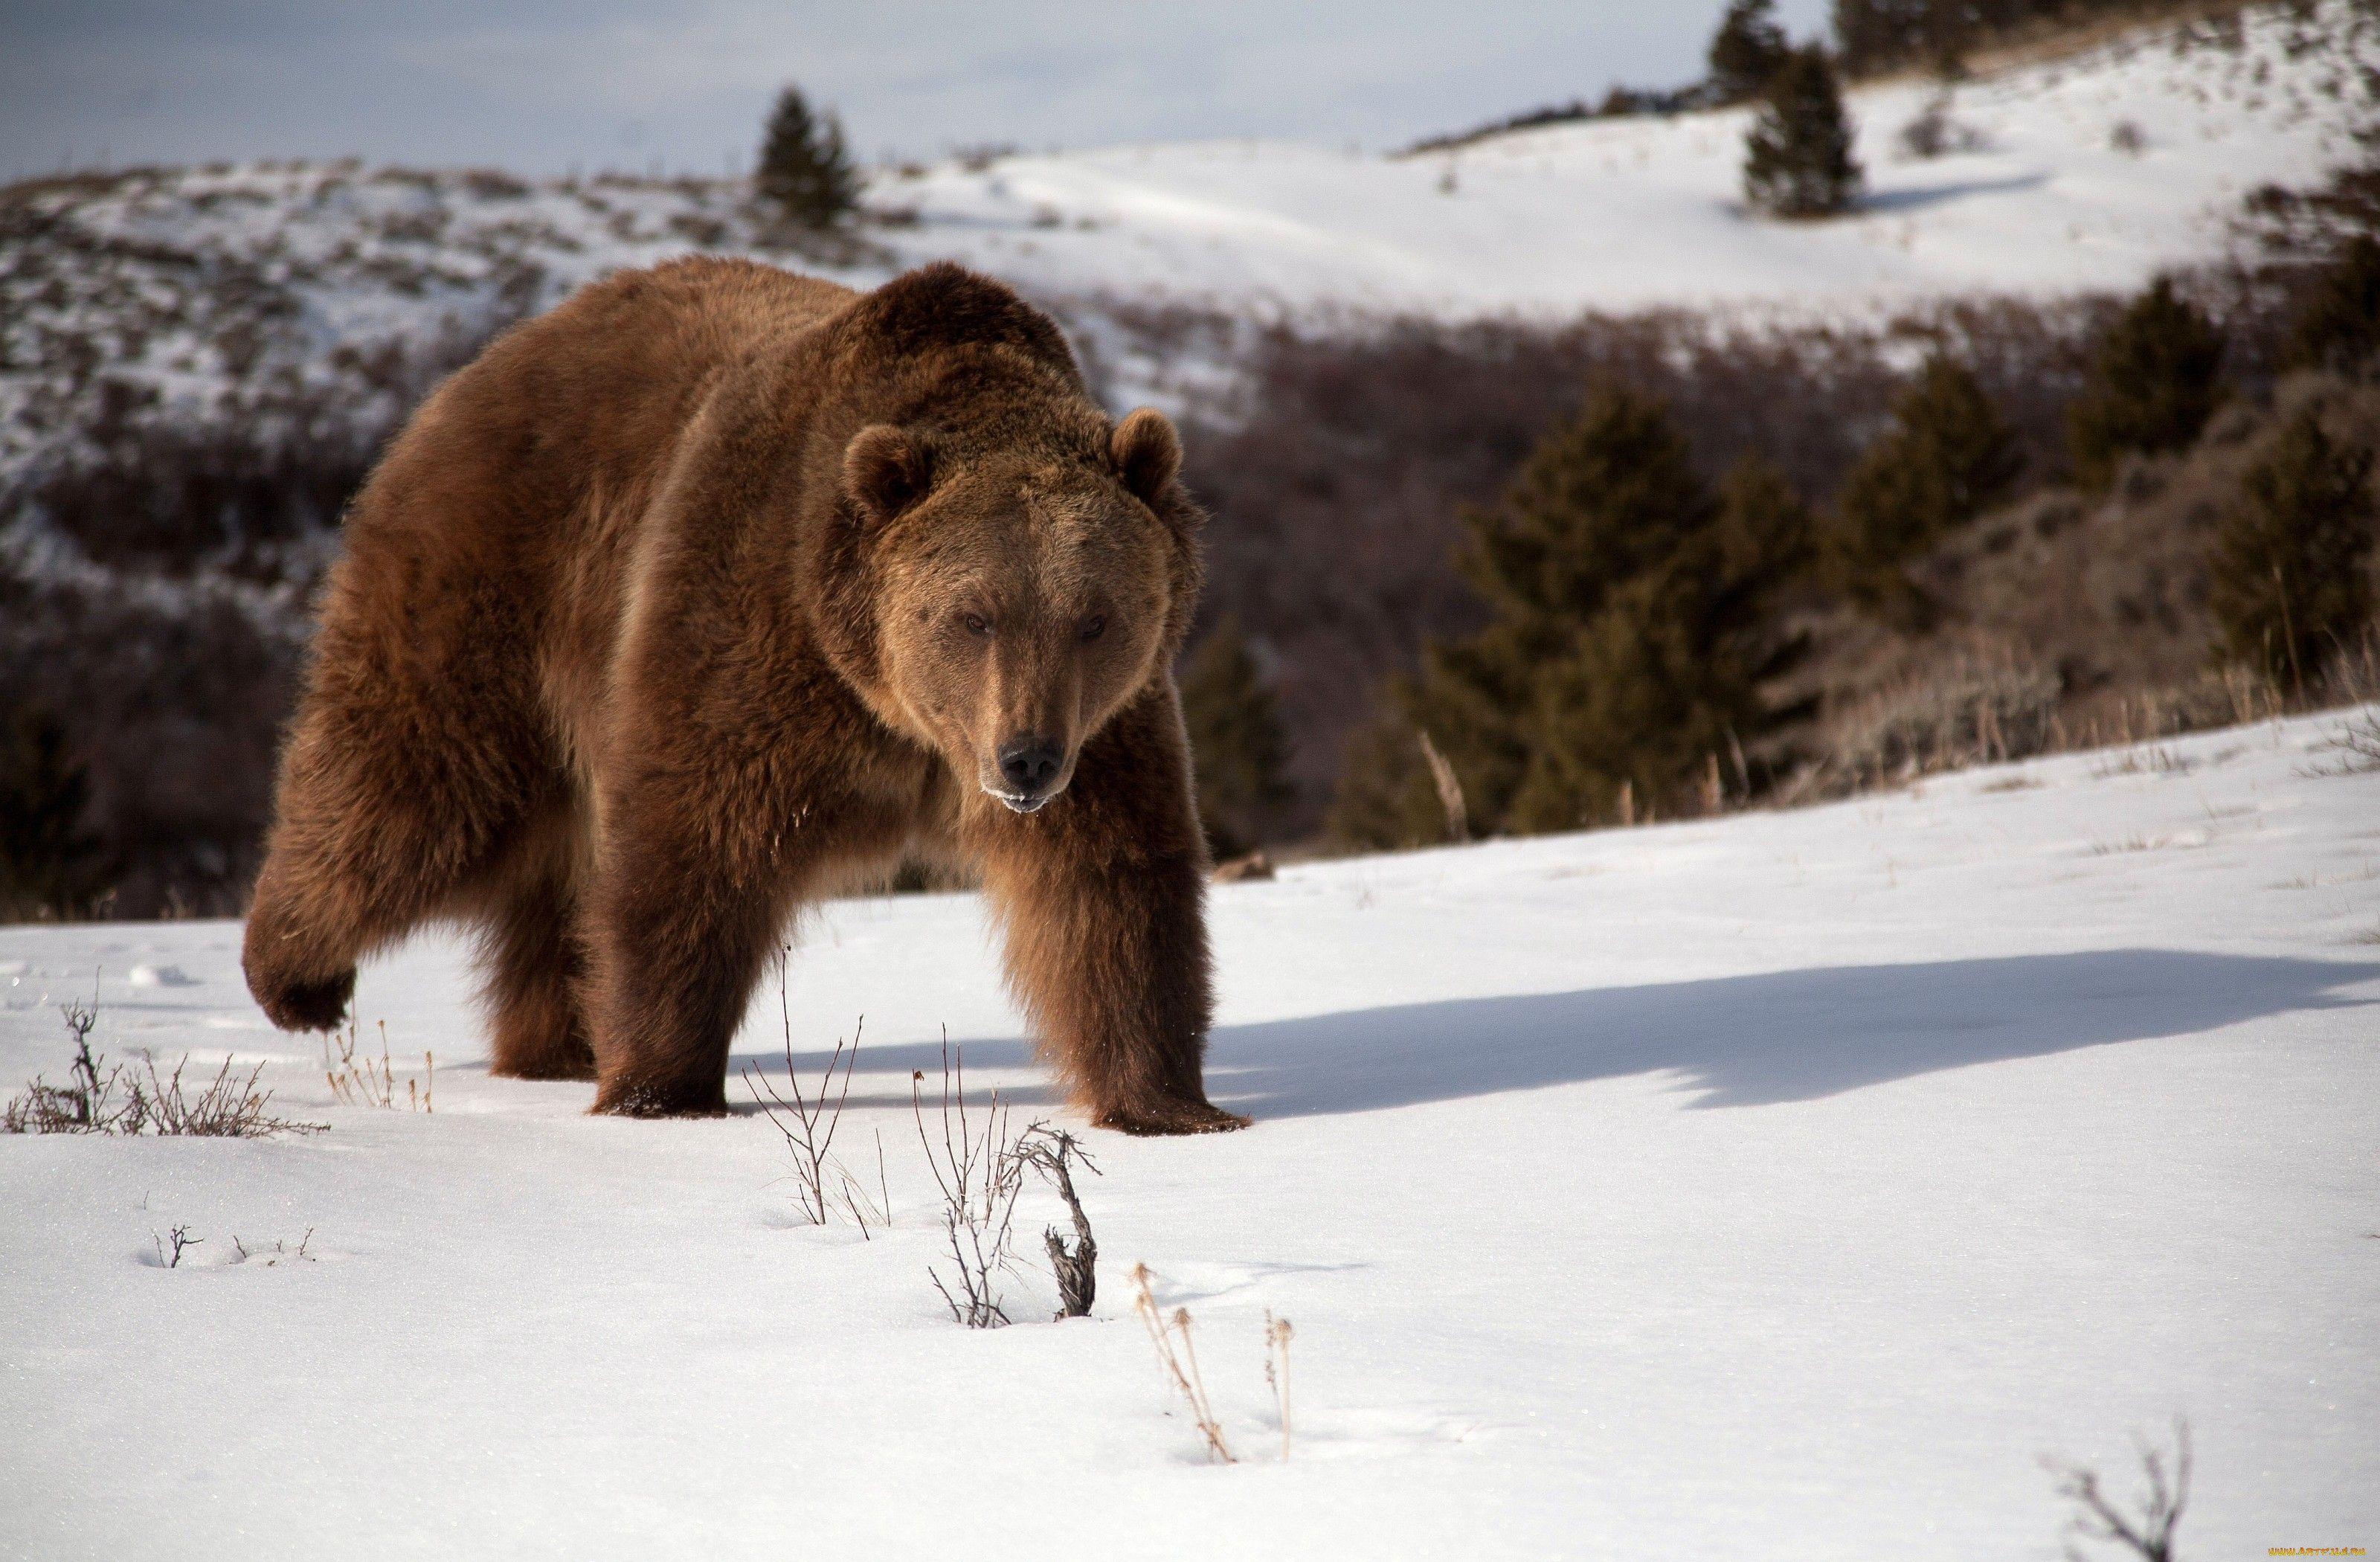 Wallpapers wildlife, giant panda, snow, animal